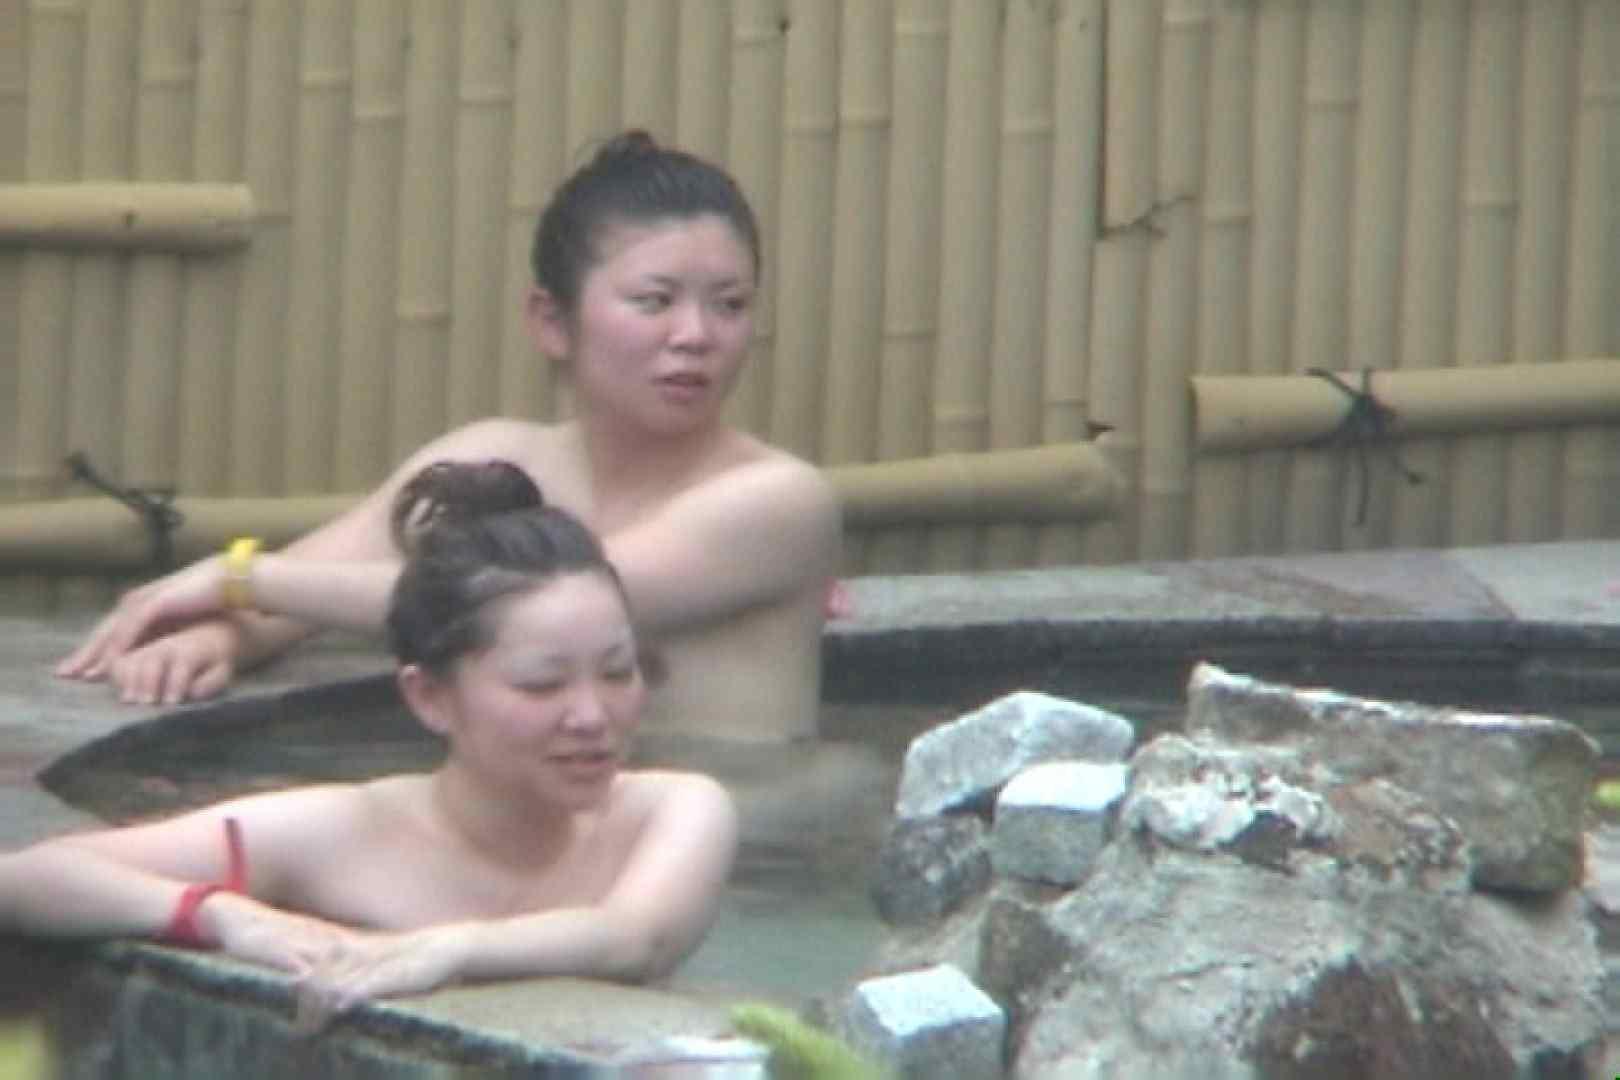 Aquaな露天風呂Vol.47【VIP限定】 盗撮   OLのエロ生活  101連発 85